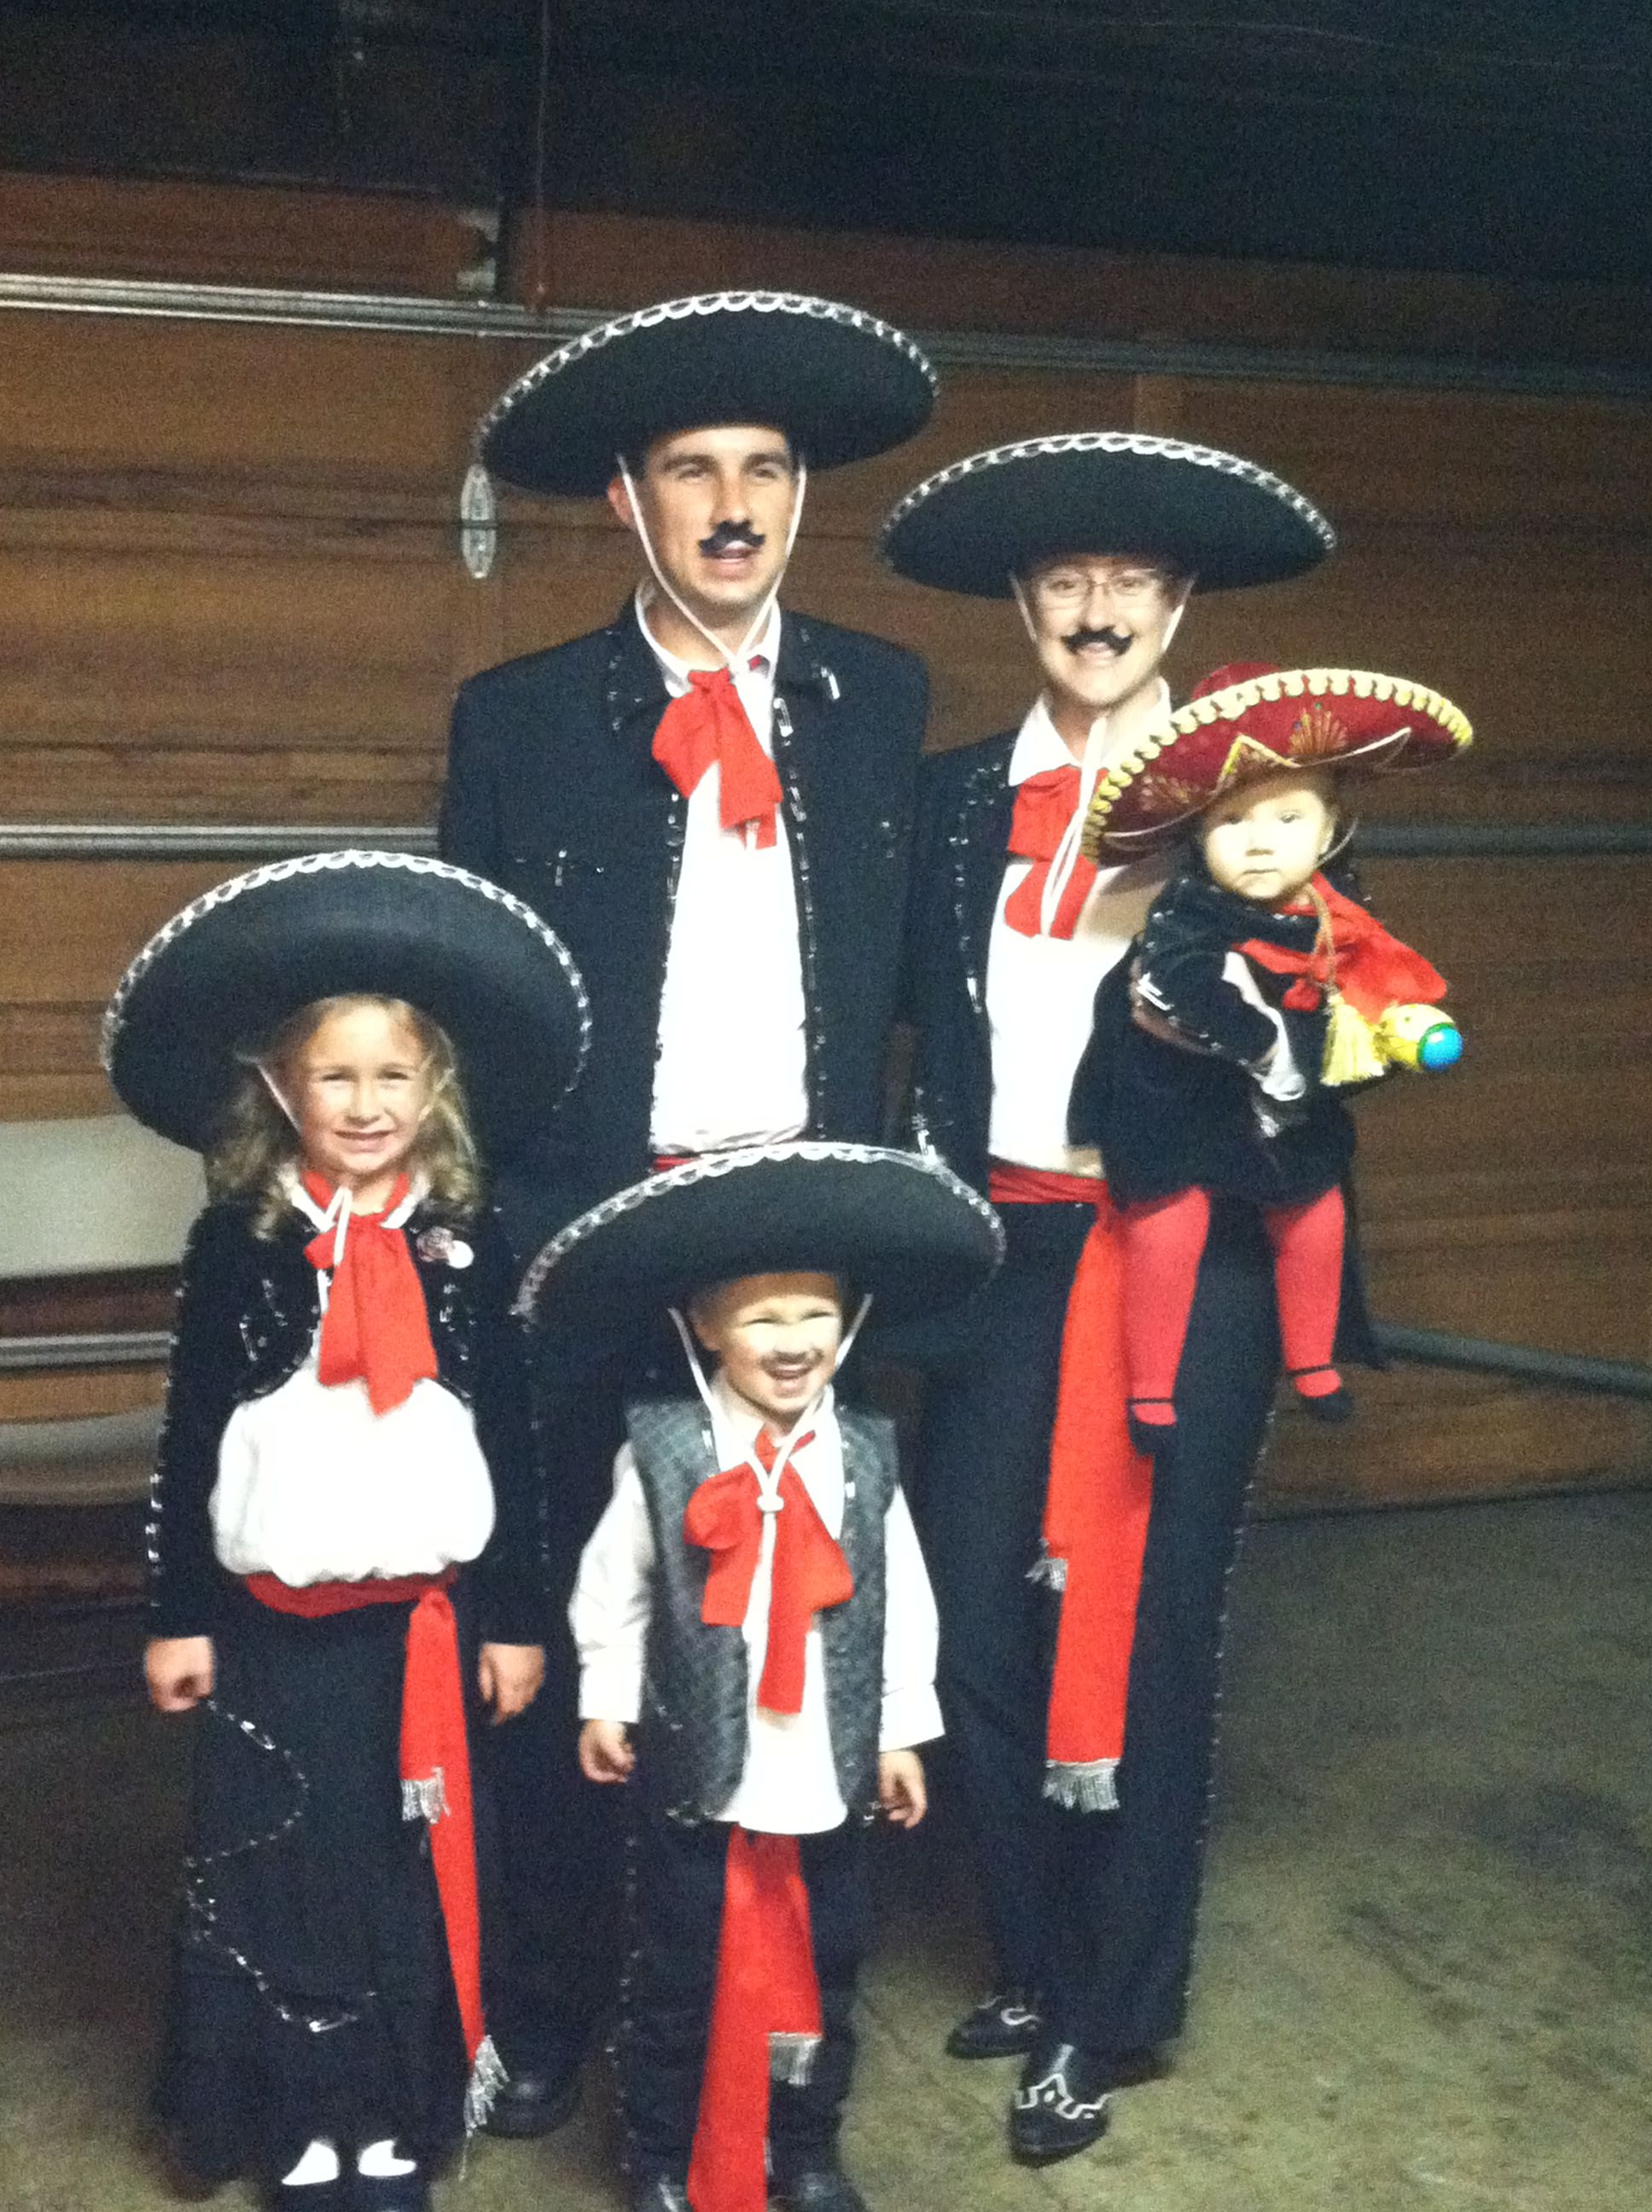 family mariachi band halloween costumesole - Band Halloween Costumes